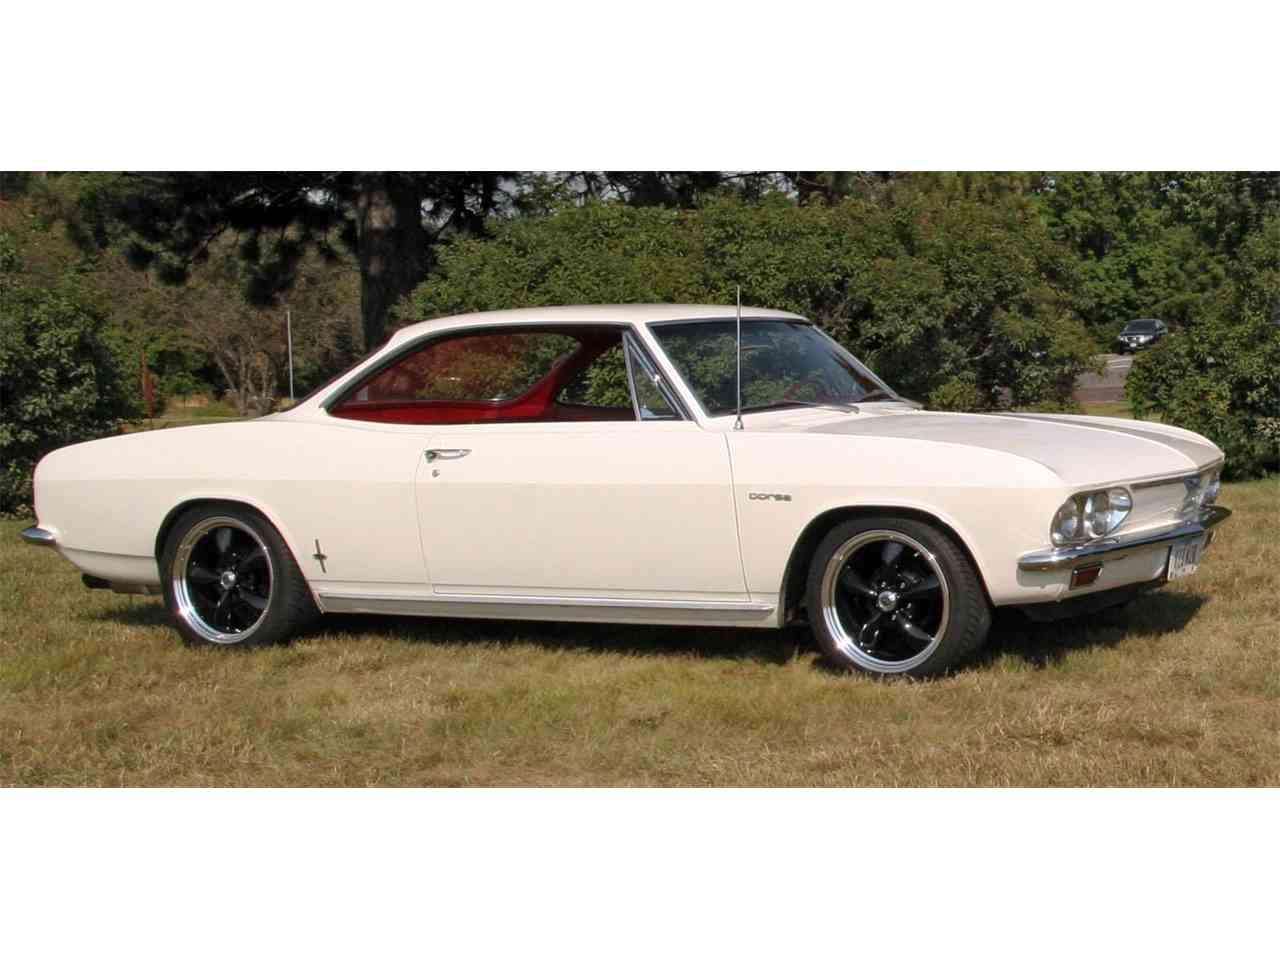 1966 Chevrolet Corsa for Sale | ClassicCars.com | CC-1081608